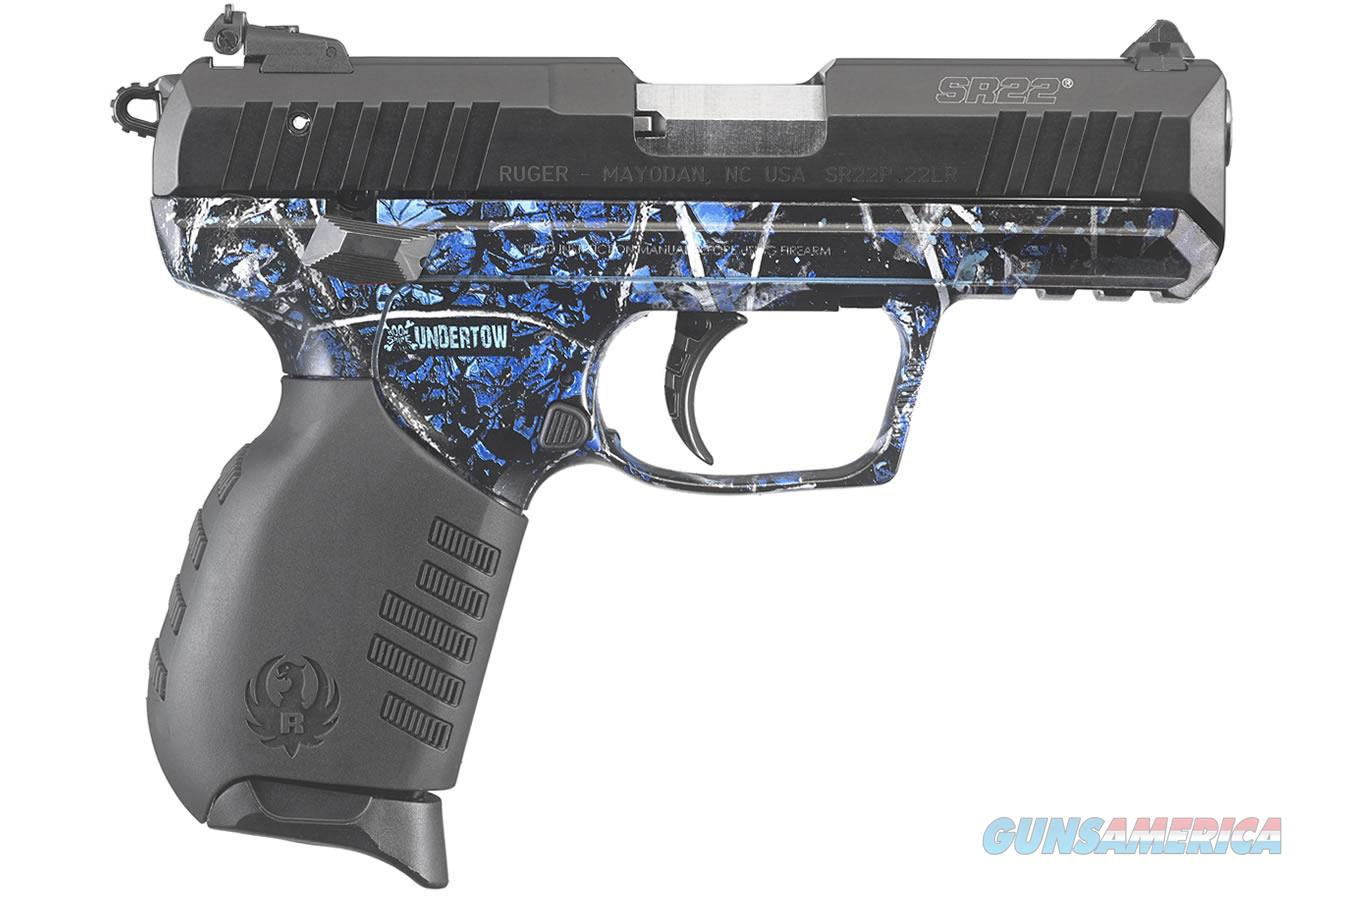 Ruger SR22PB .22 LR Moonshine Camo Undertow 3635   Guns > Pistols > Ruger Semi-Auto Pistols > SR Family > SR22